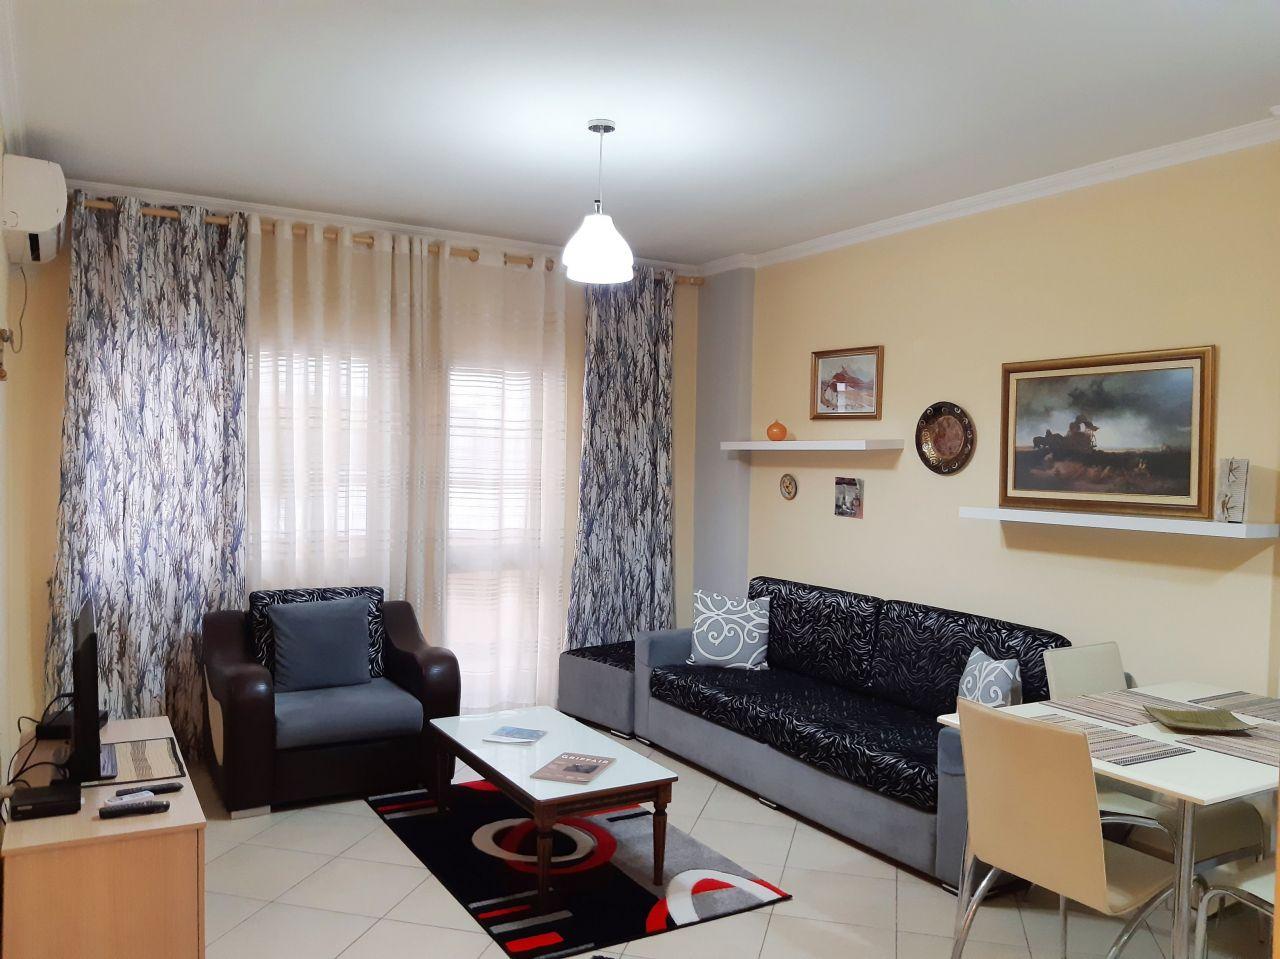 Однокомнатная квартира в аренду в Тиране, Албания, недалеко от центра города